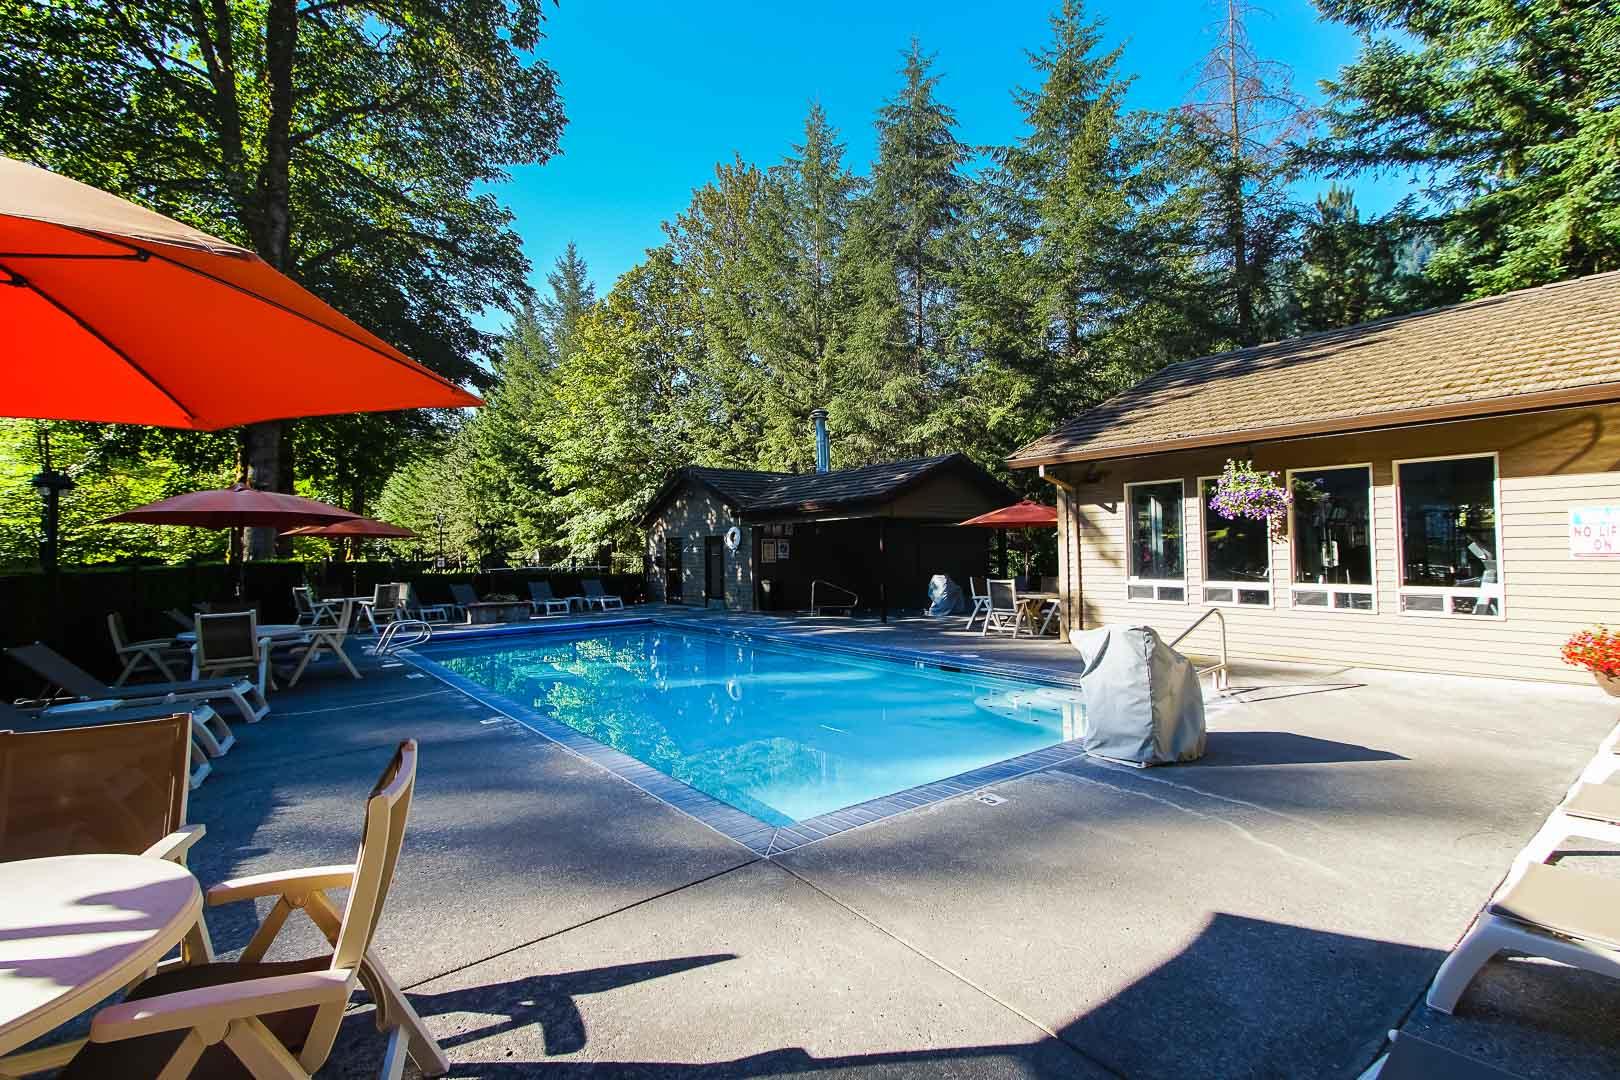 A crisp outdoor swimming pool at VRI's Whispering Woods Resort in Oregon.